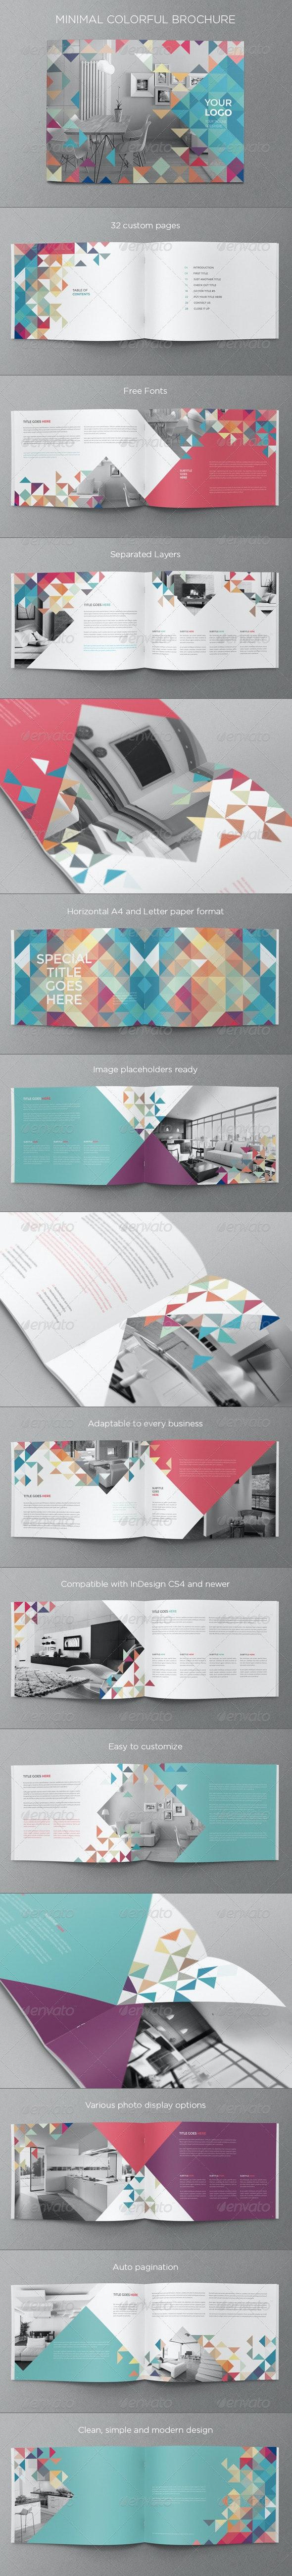 Minimal Colorful Brochure - Brochures Print Templates